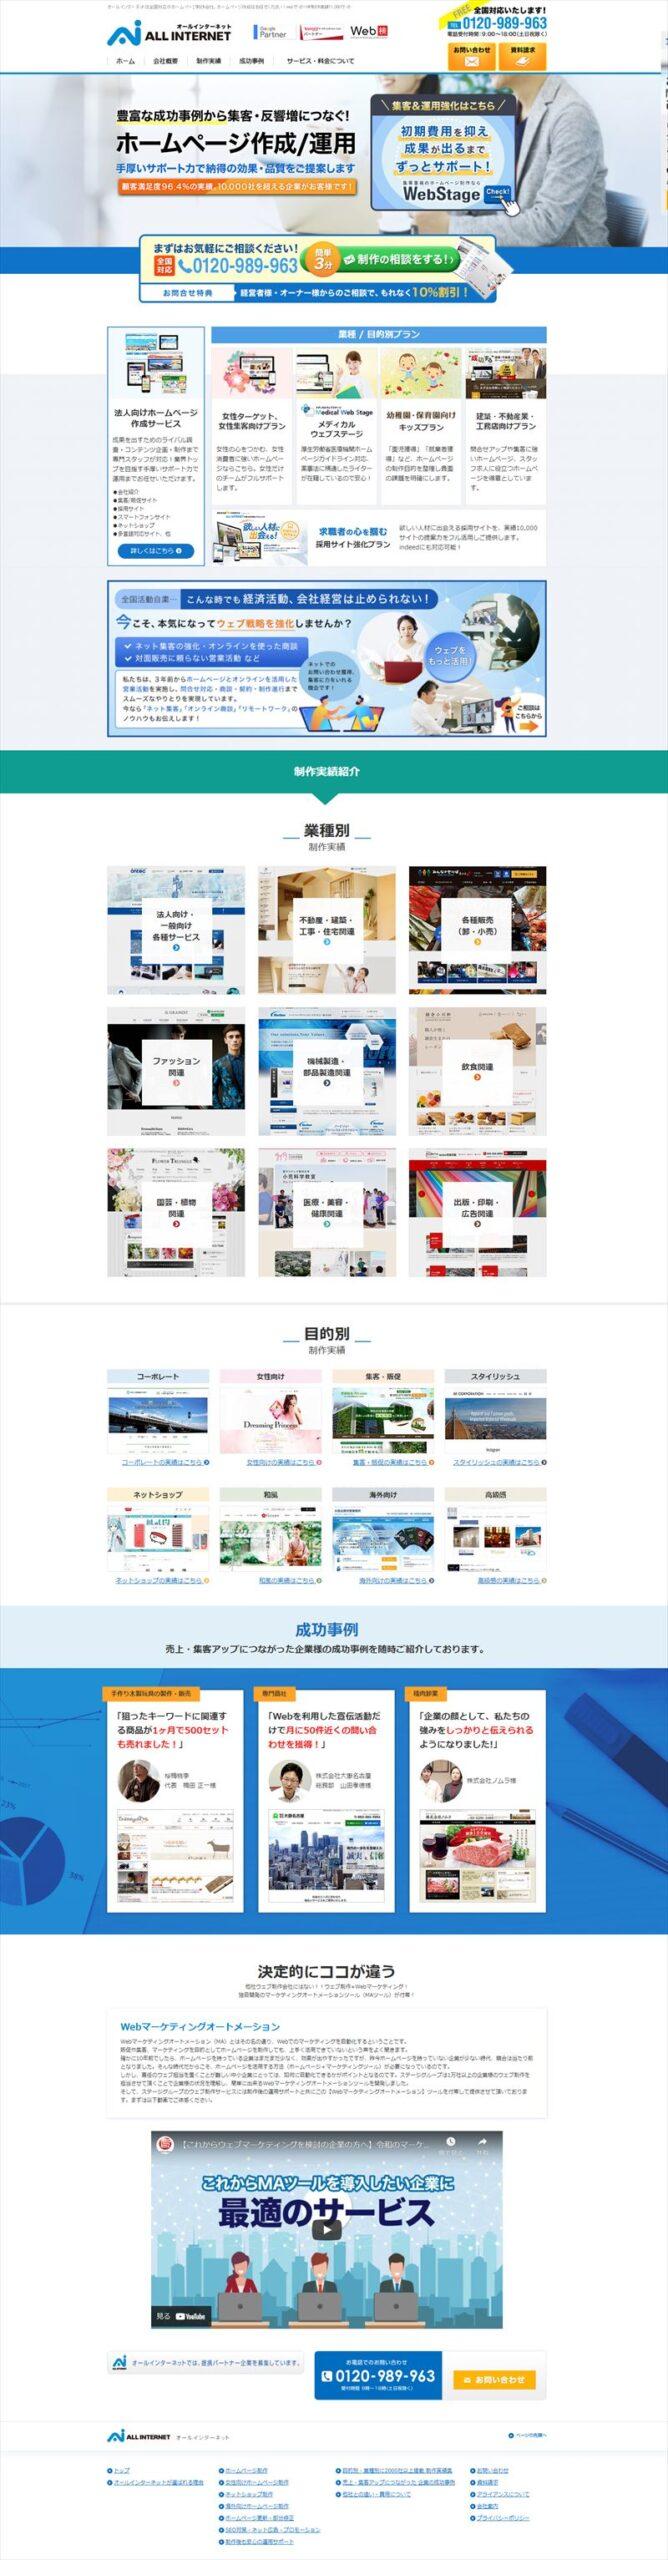 all-internet-jp